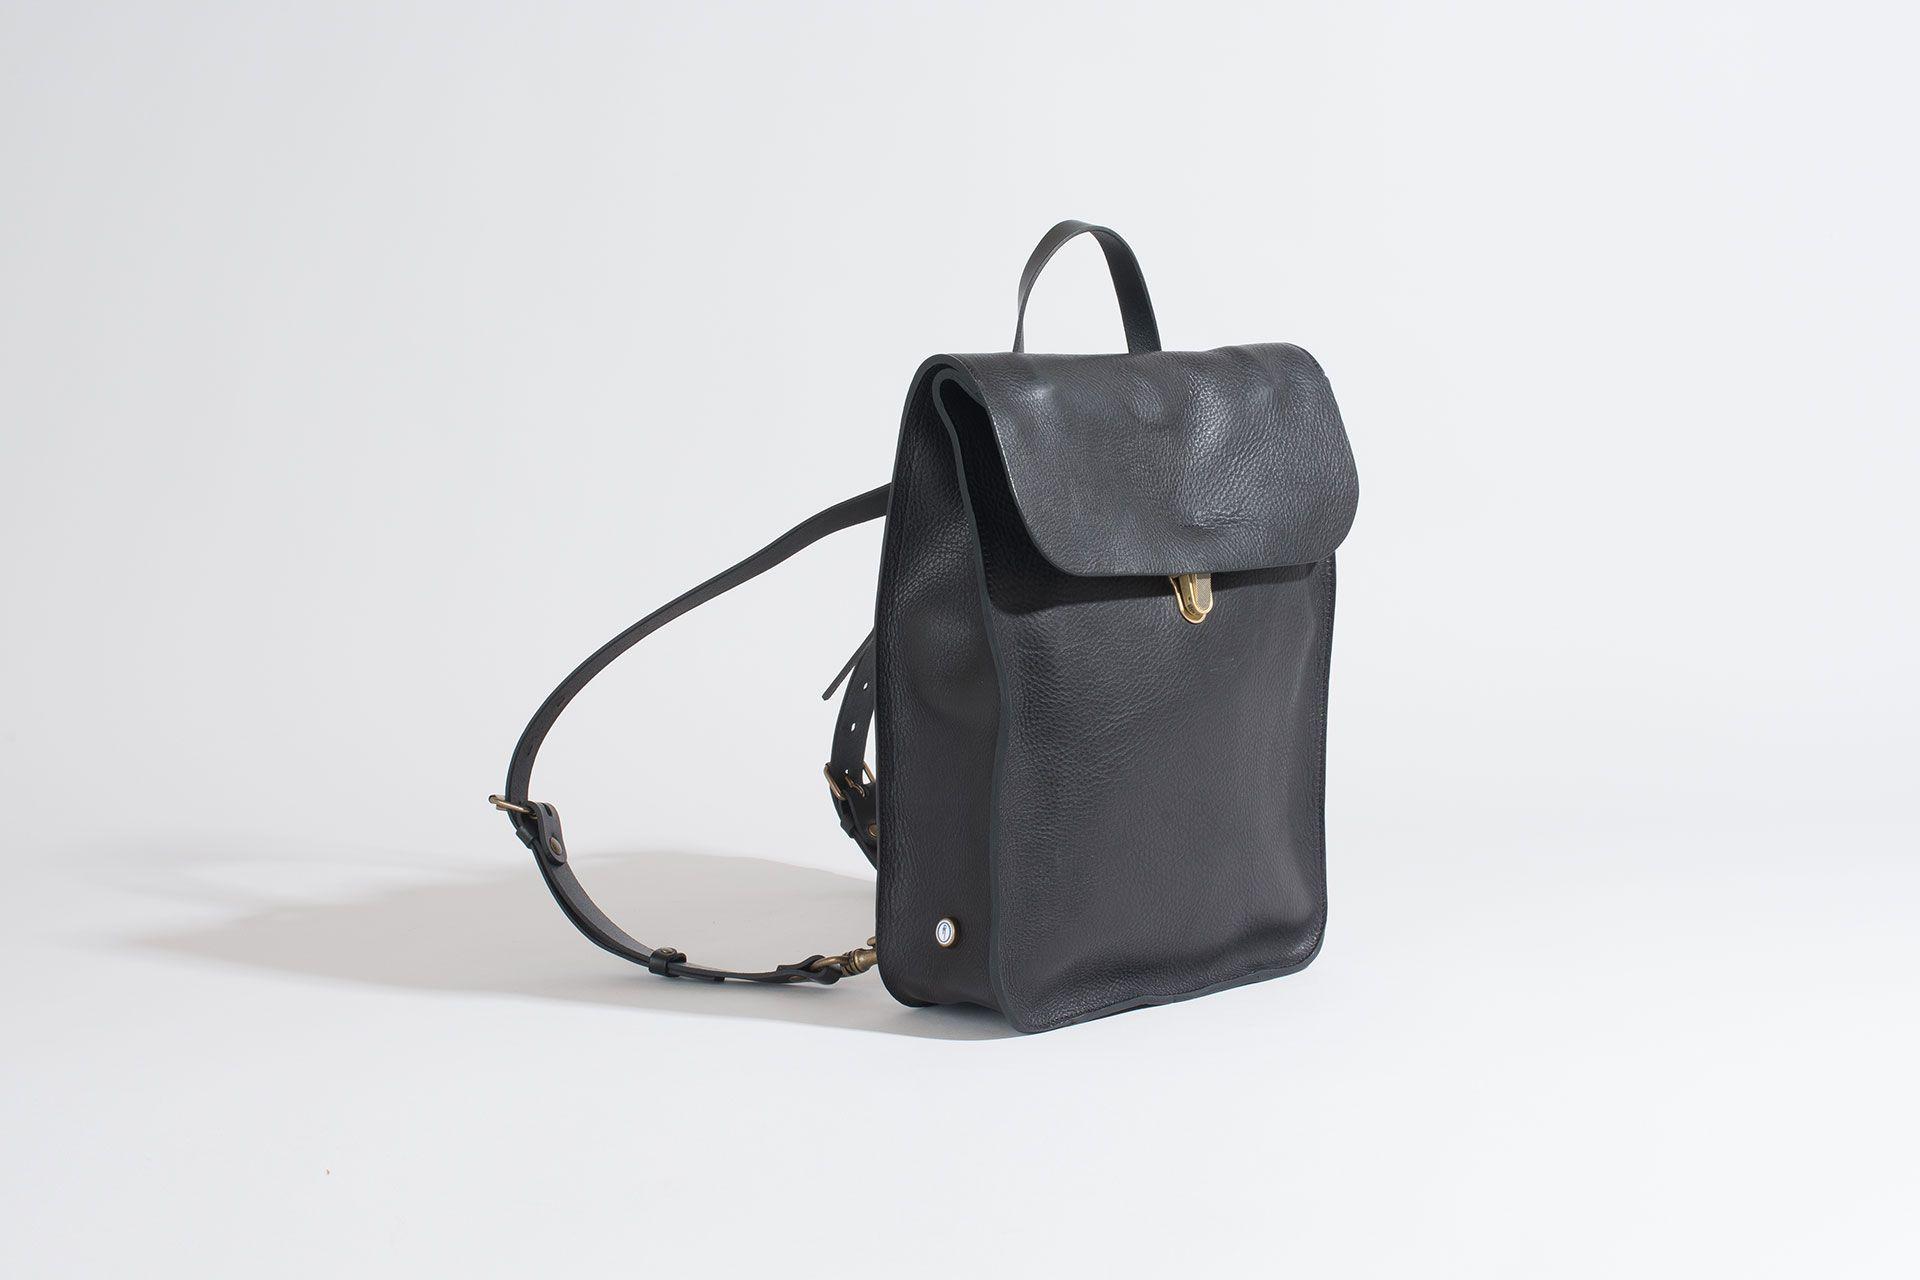 Sac à dos en cuir pour Homme I Made in France | Le sac à dos